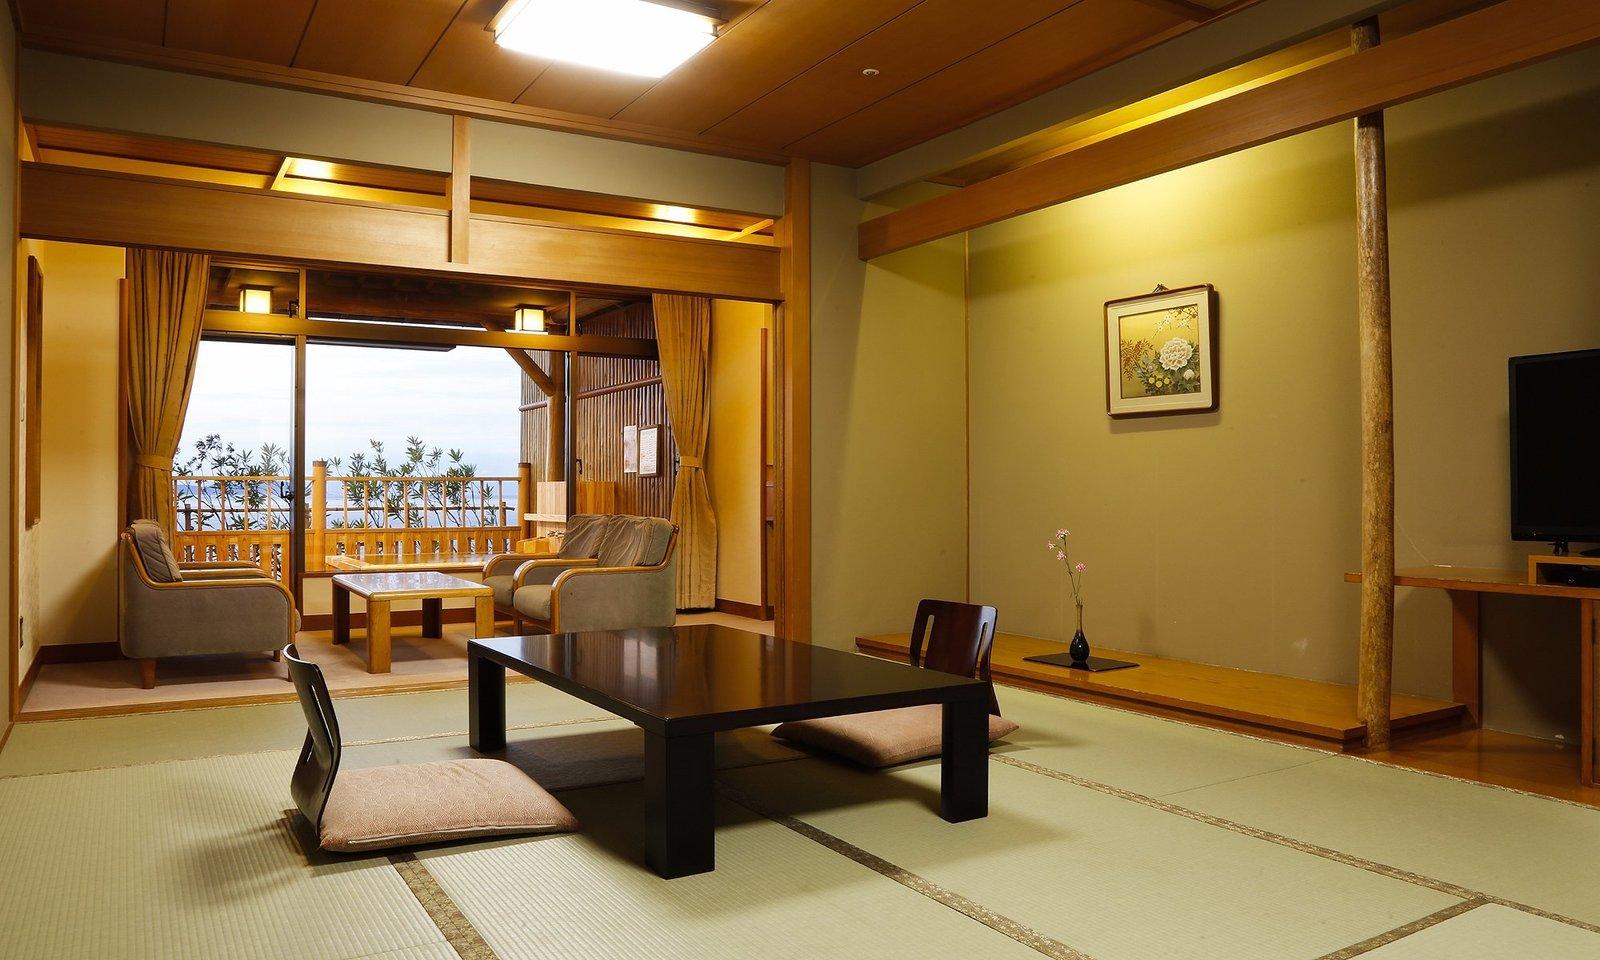 Dining Room, Chair, Ceiling Lighting, and Table  Villa Rakuen